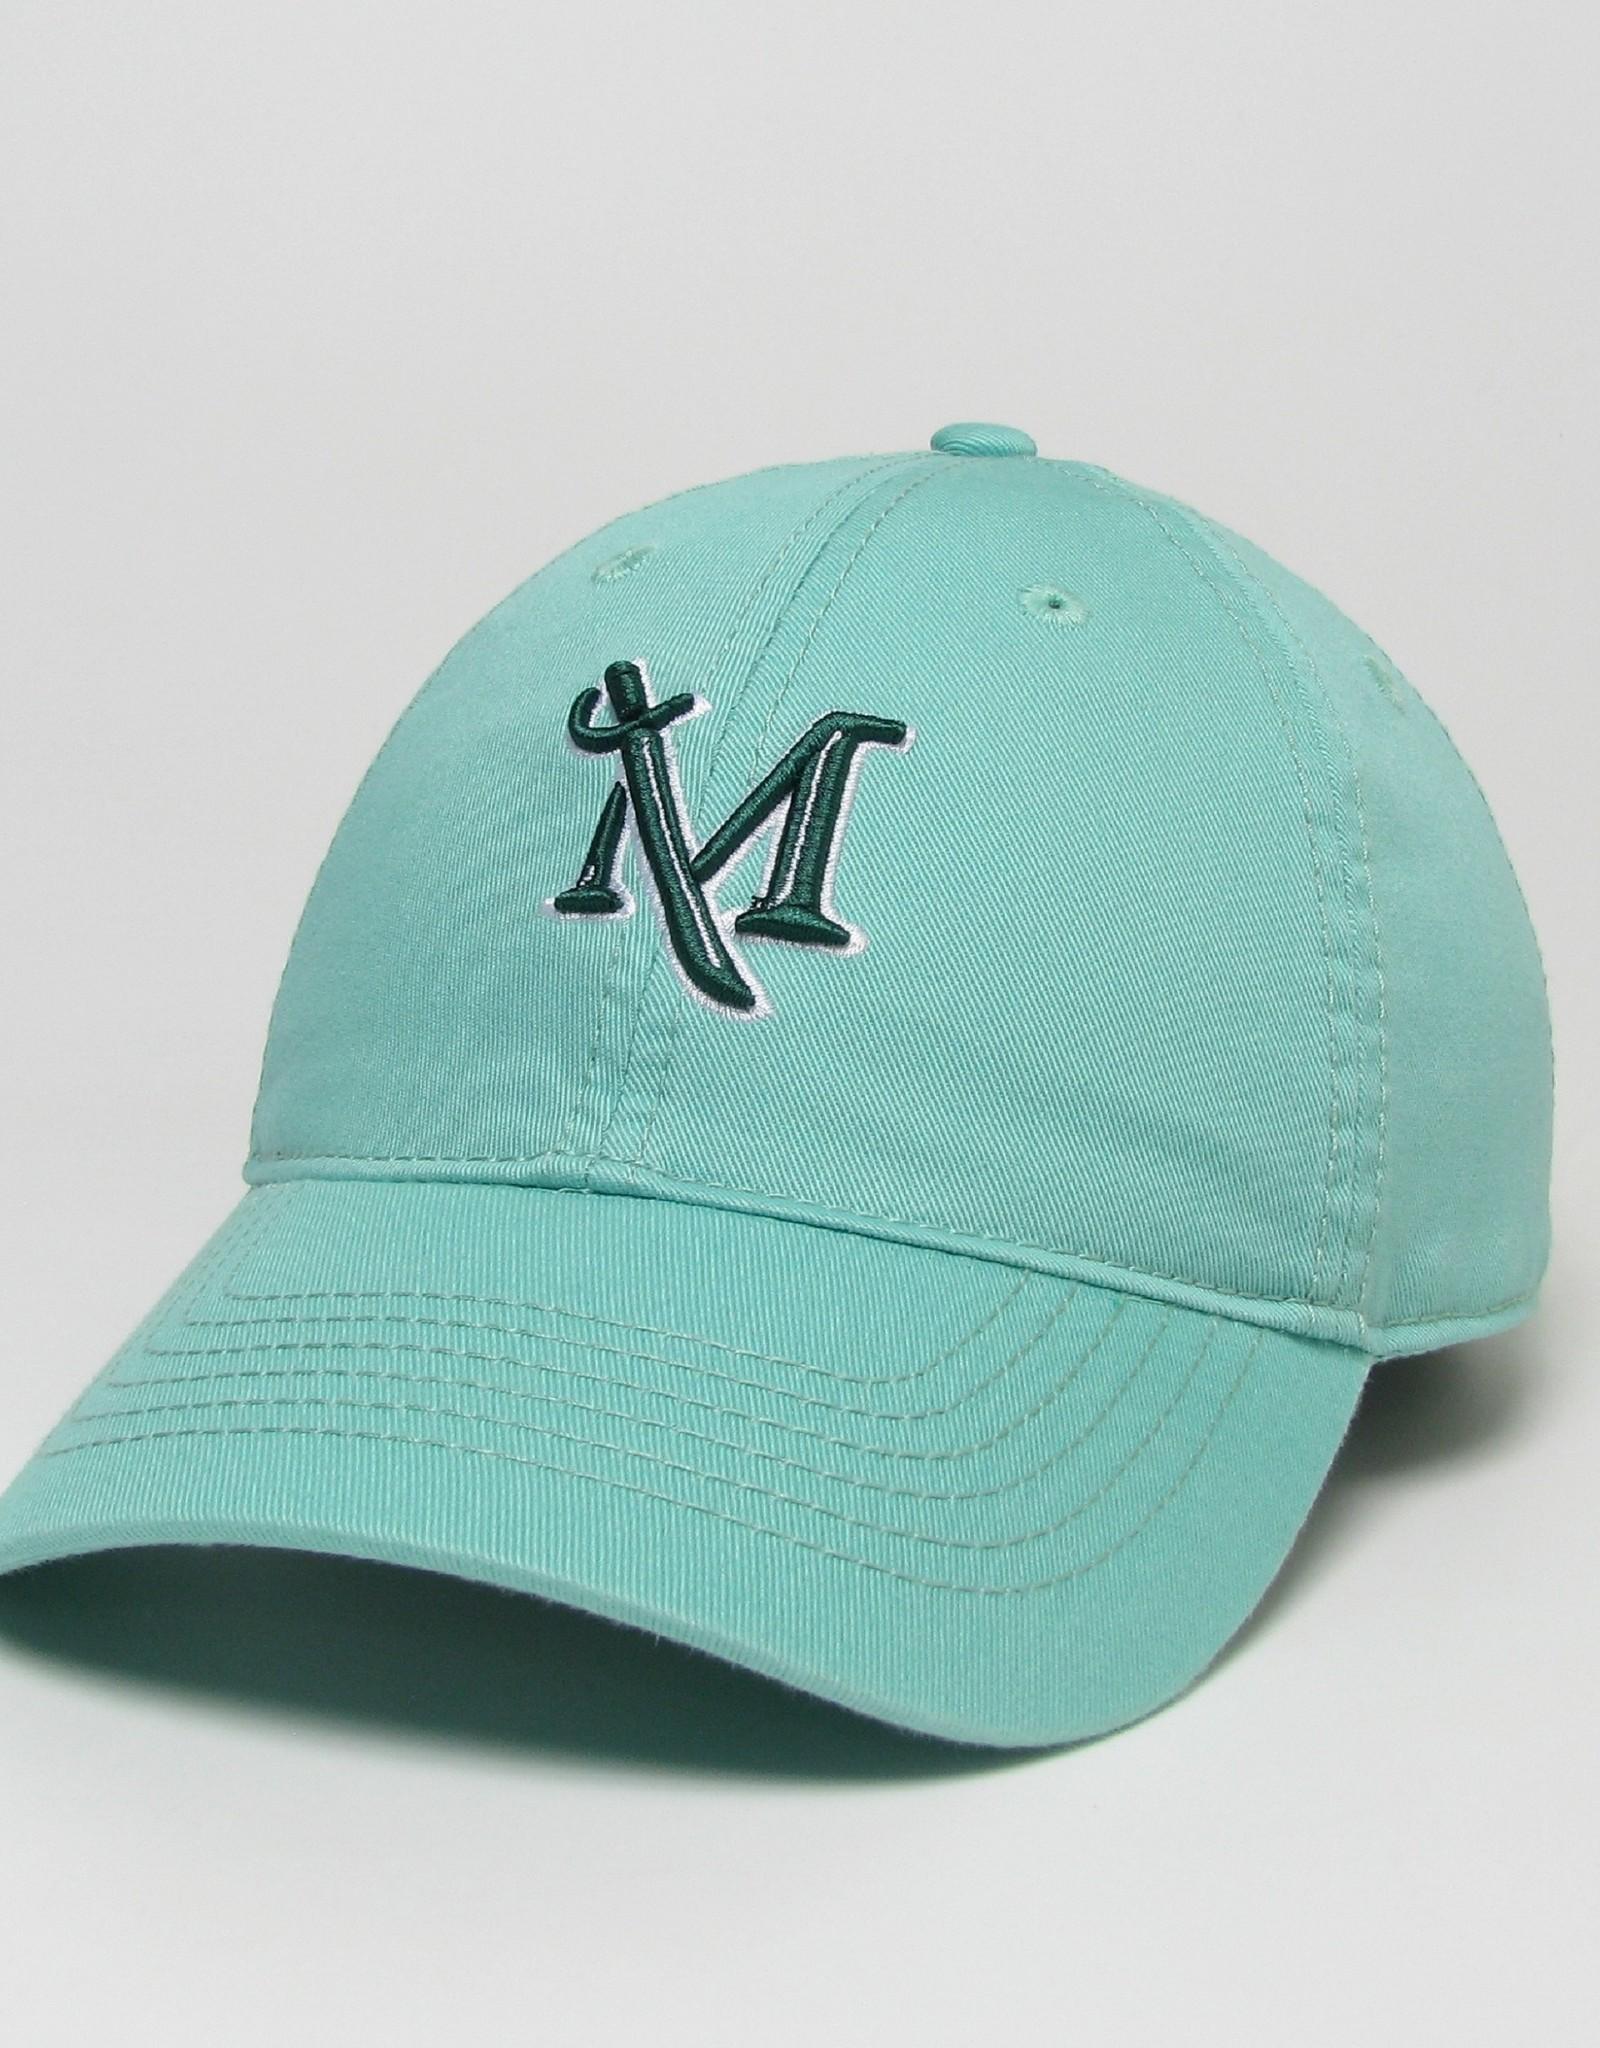 Adjustable Twill Cap (Various Colors)